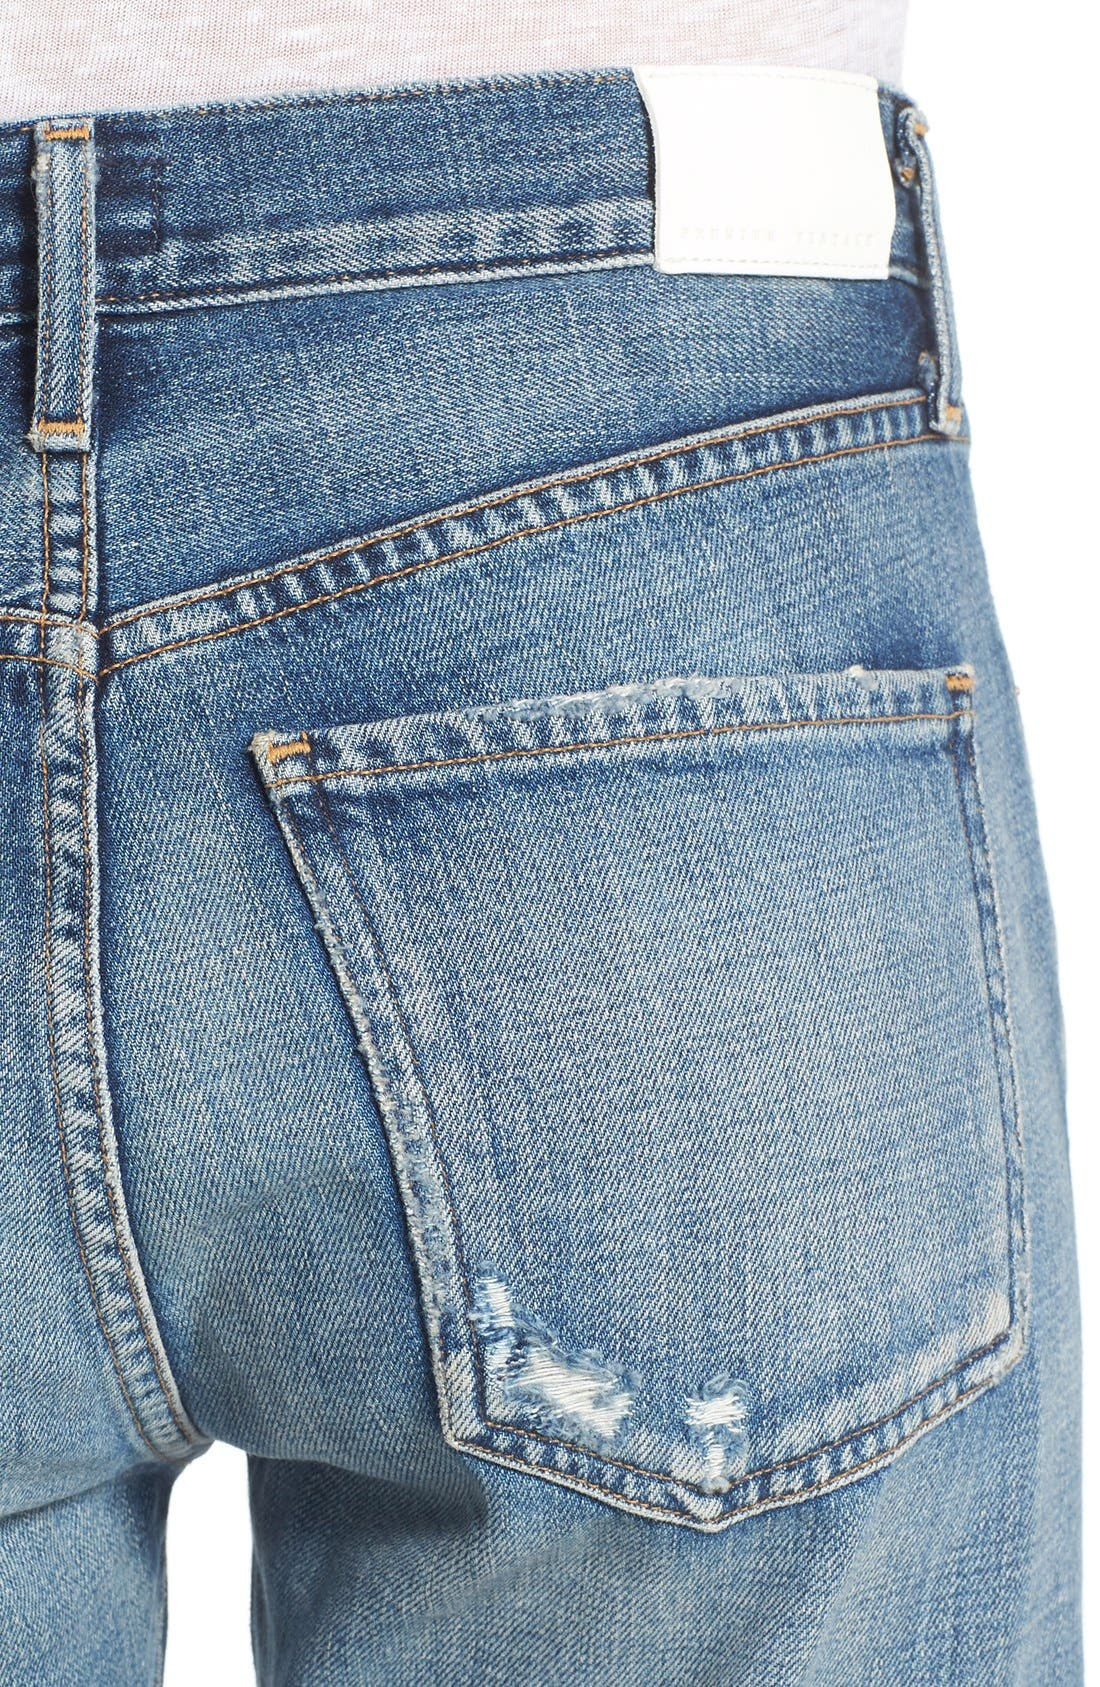 Liya High Waist Slim Boyfriend Jeans,                             Alternate thumbnail 4, color,                             426